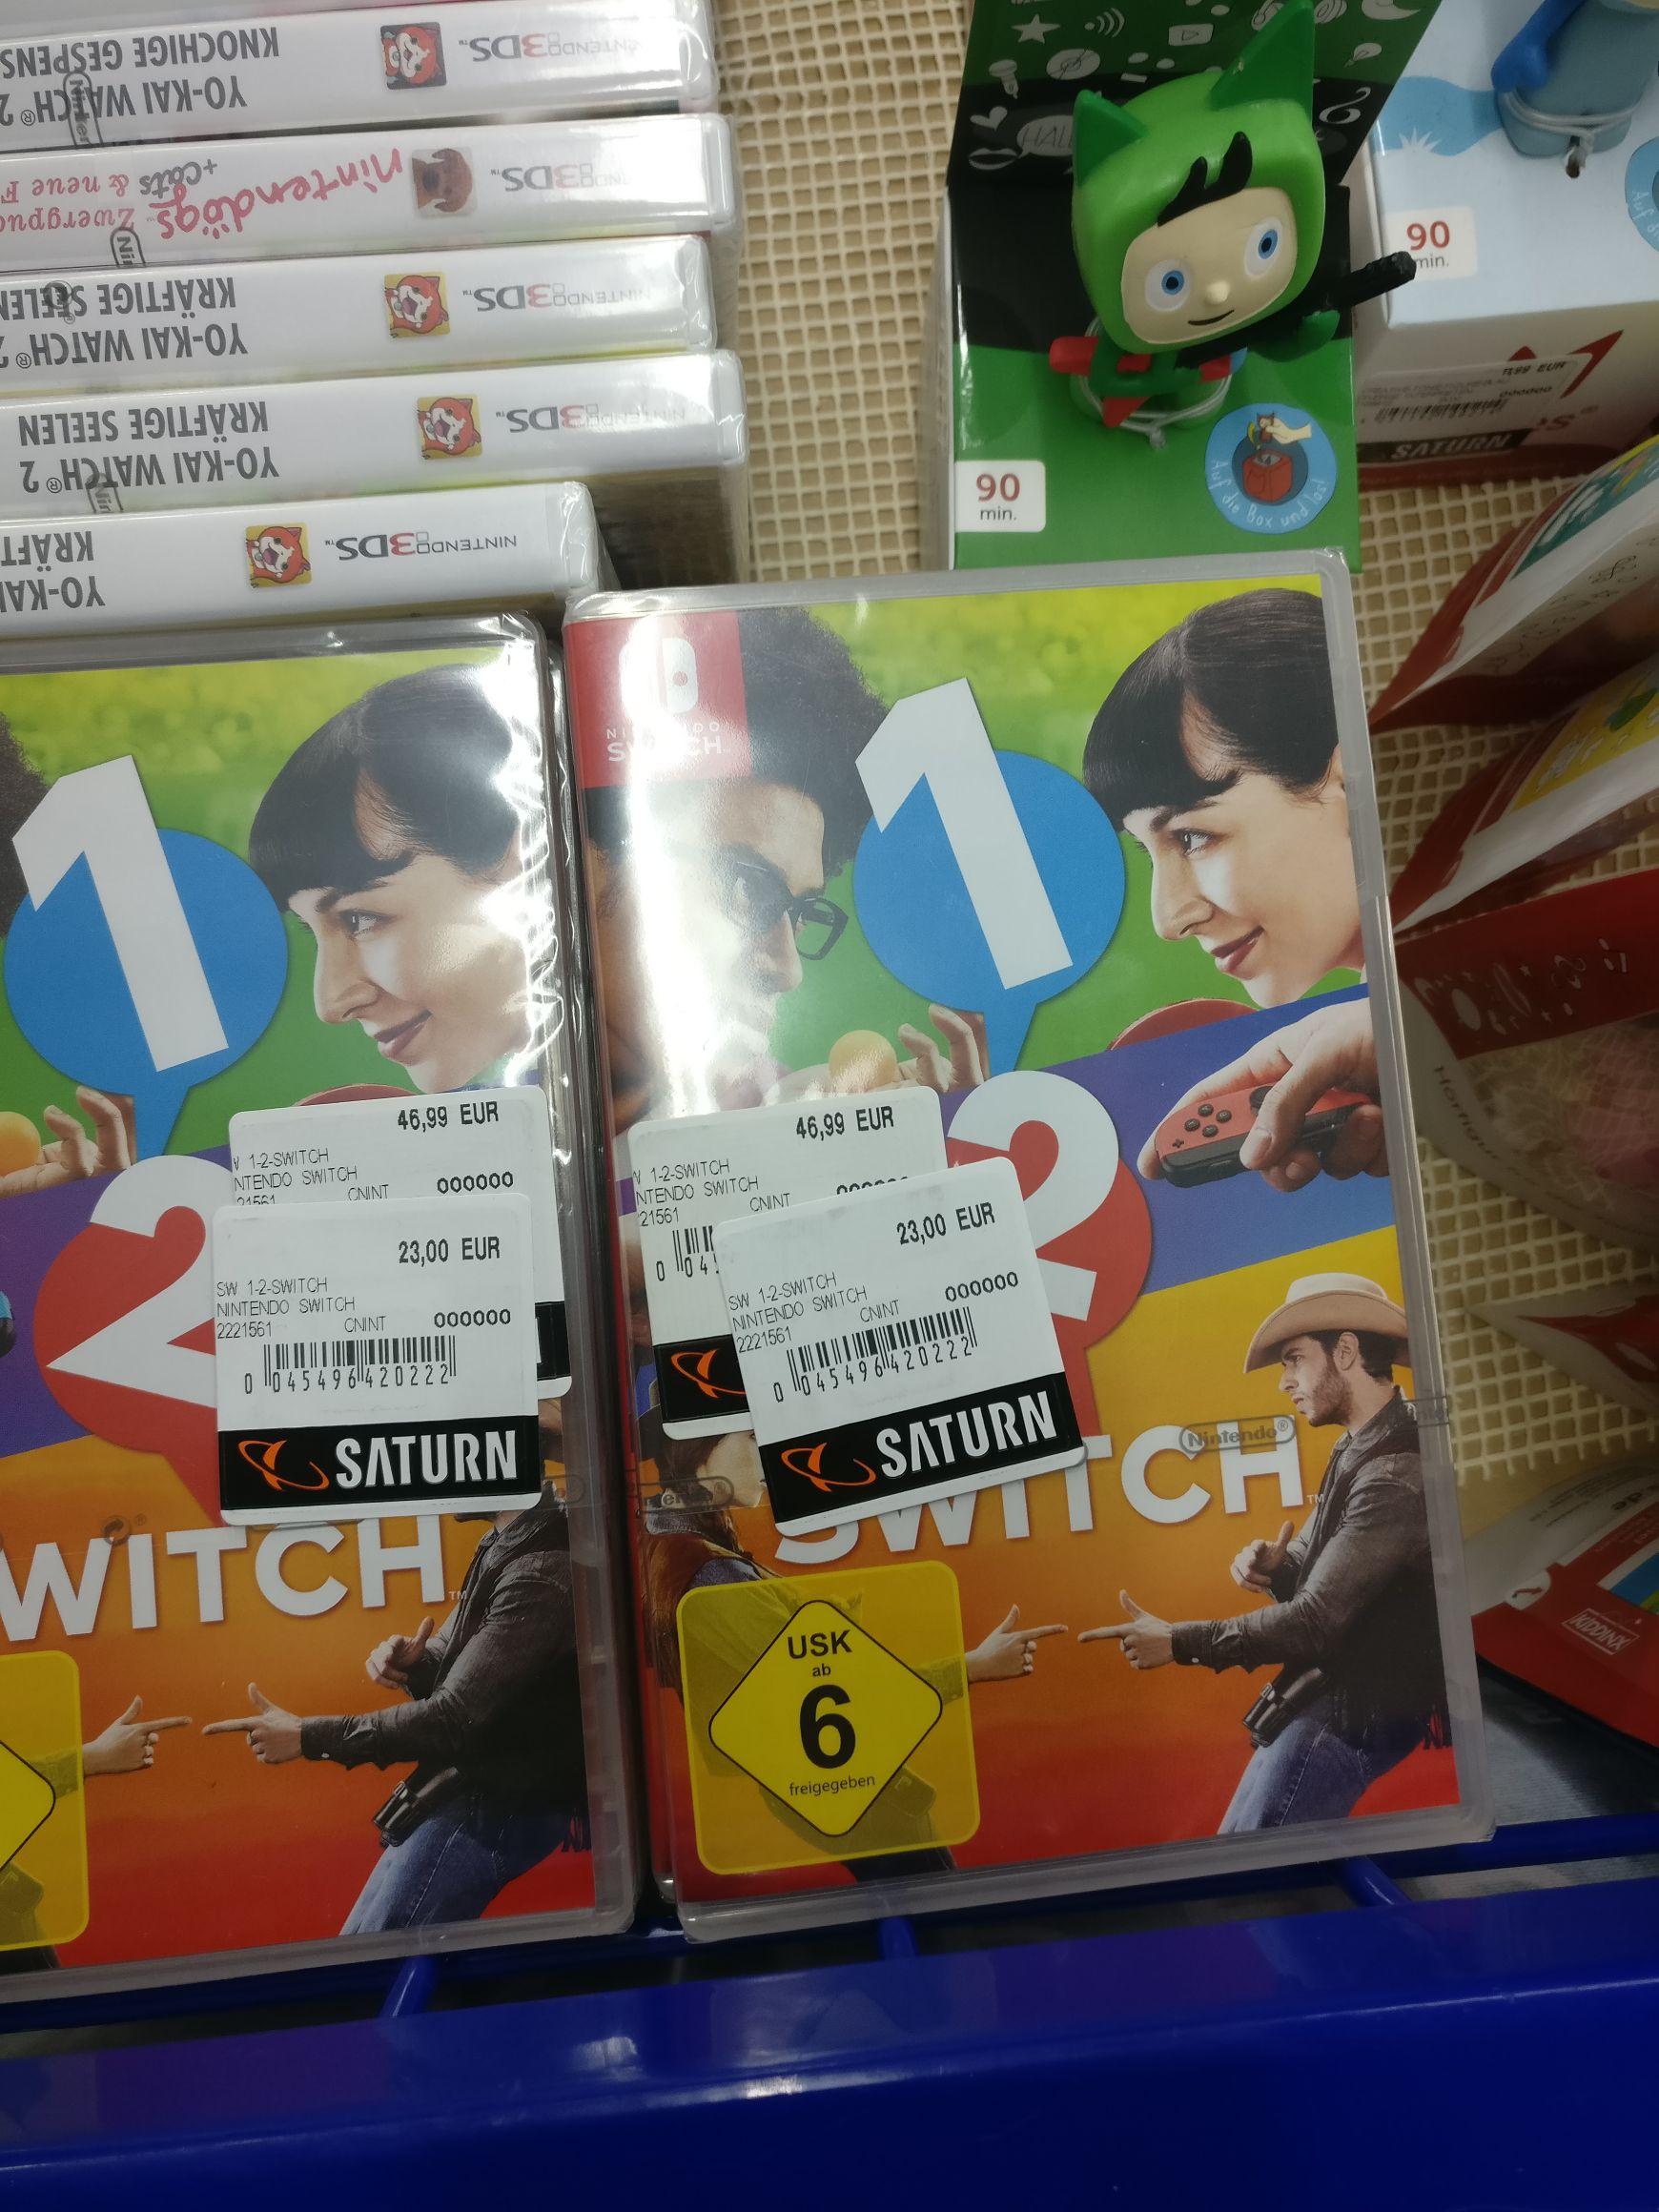 1 2 Switch [Saturn Leonberg]